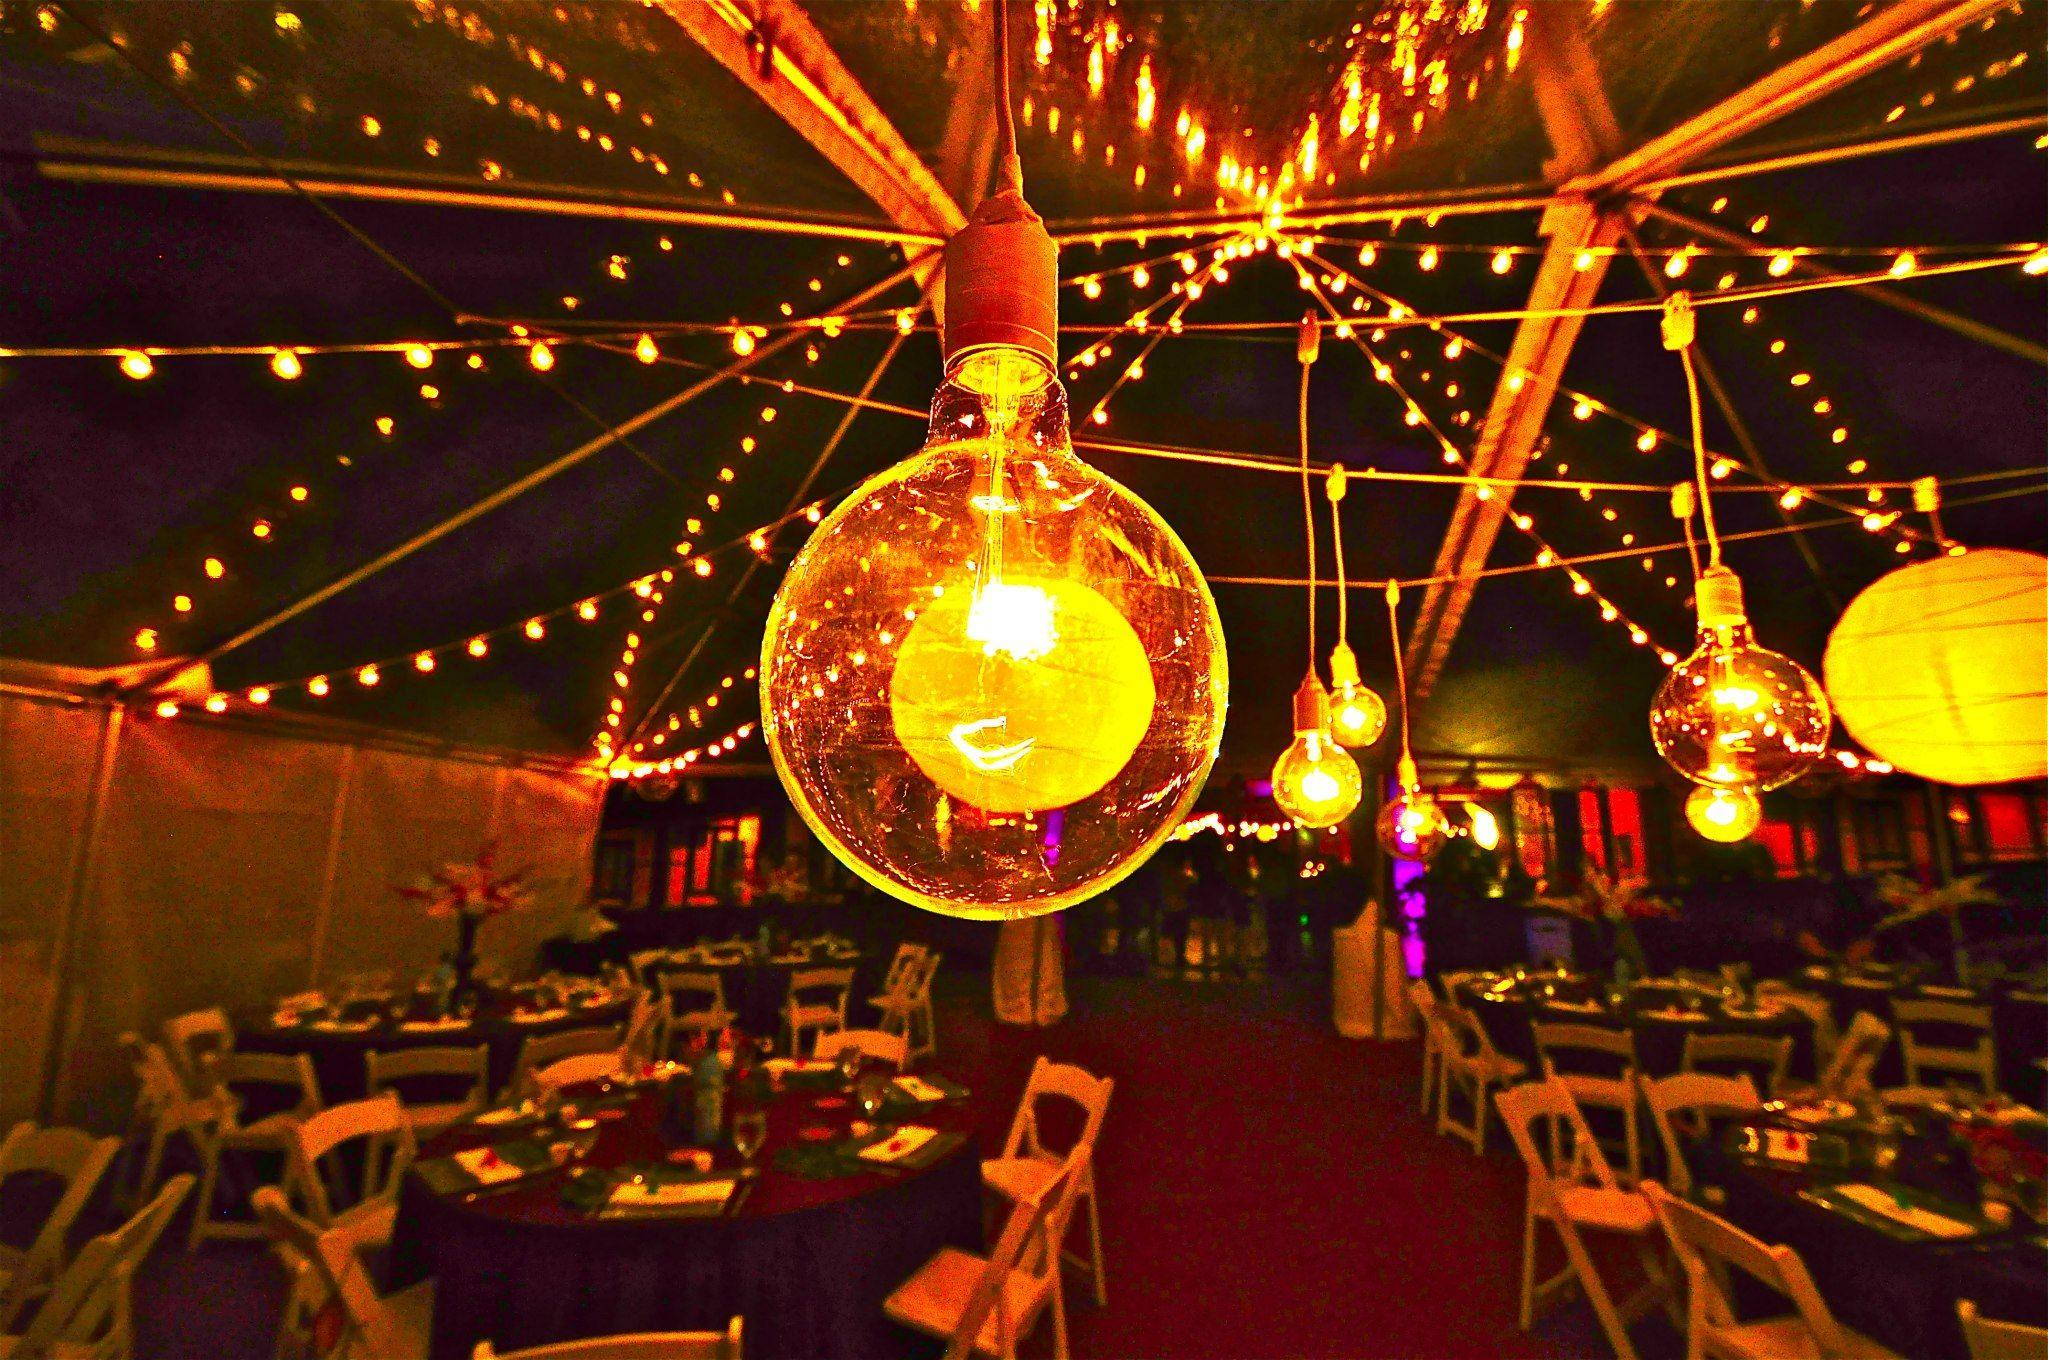 new light and market joey lights york aimed lighting img uplight